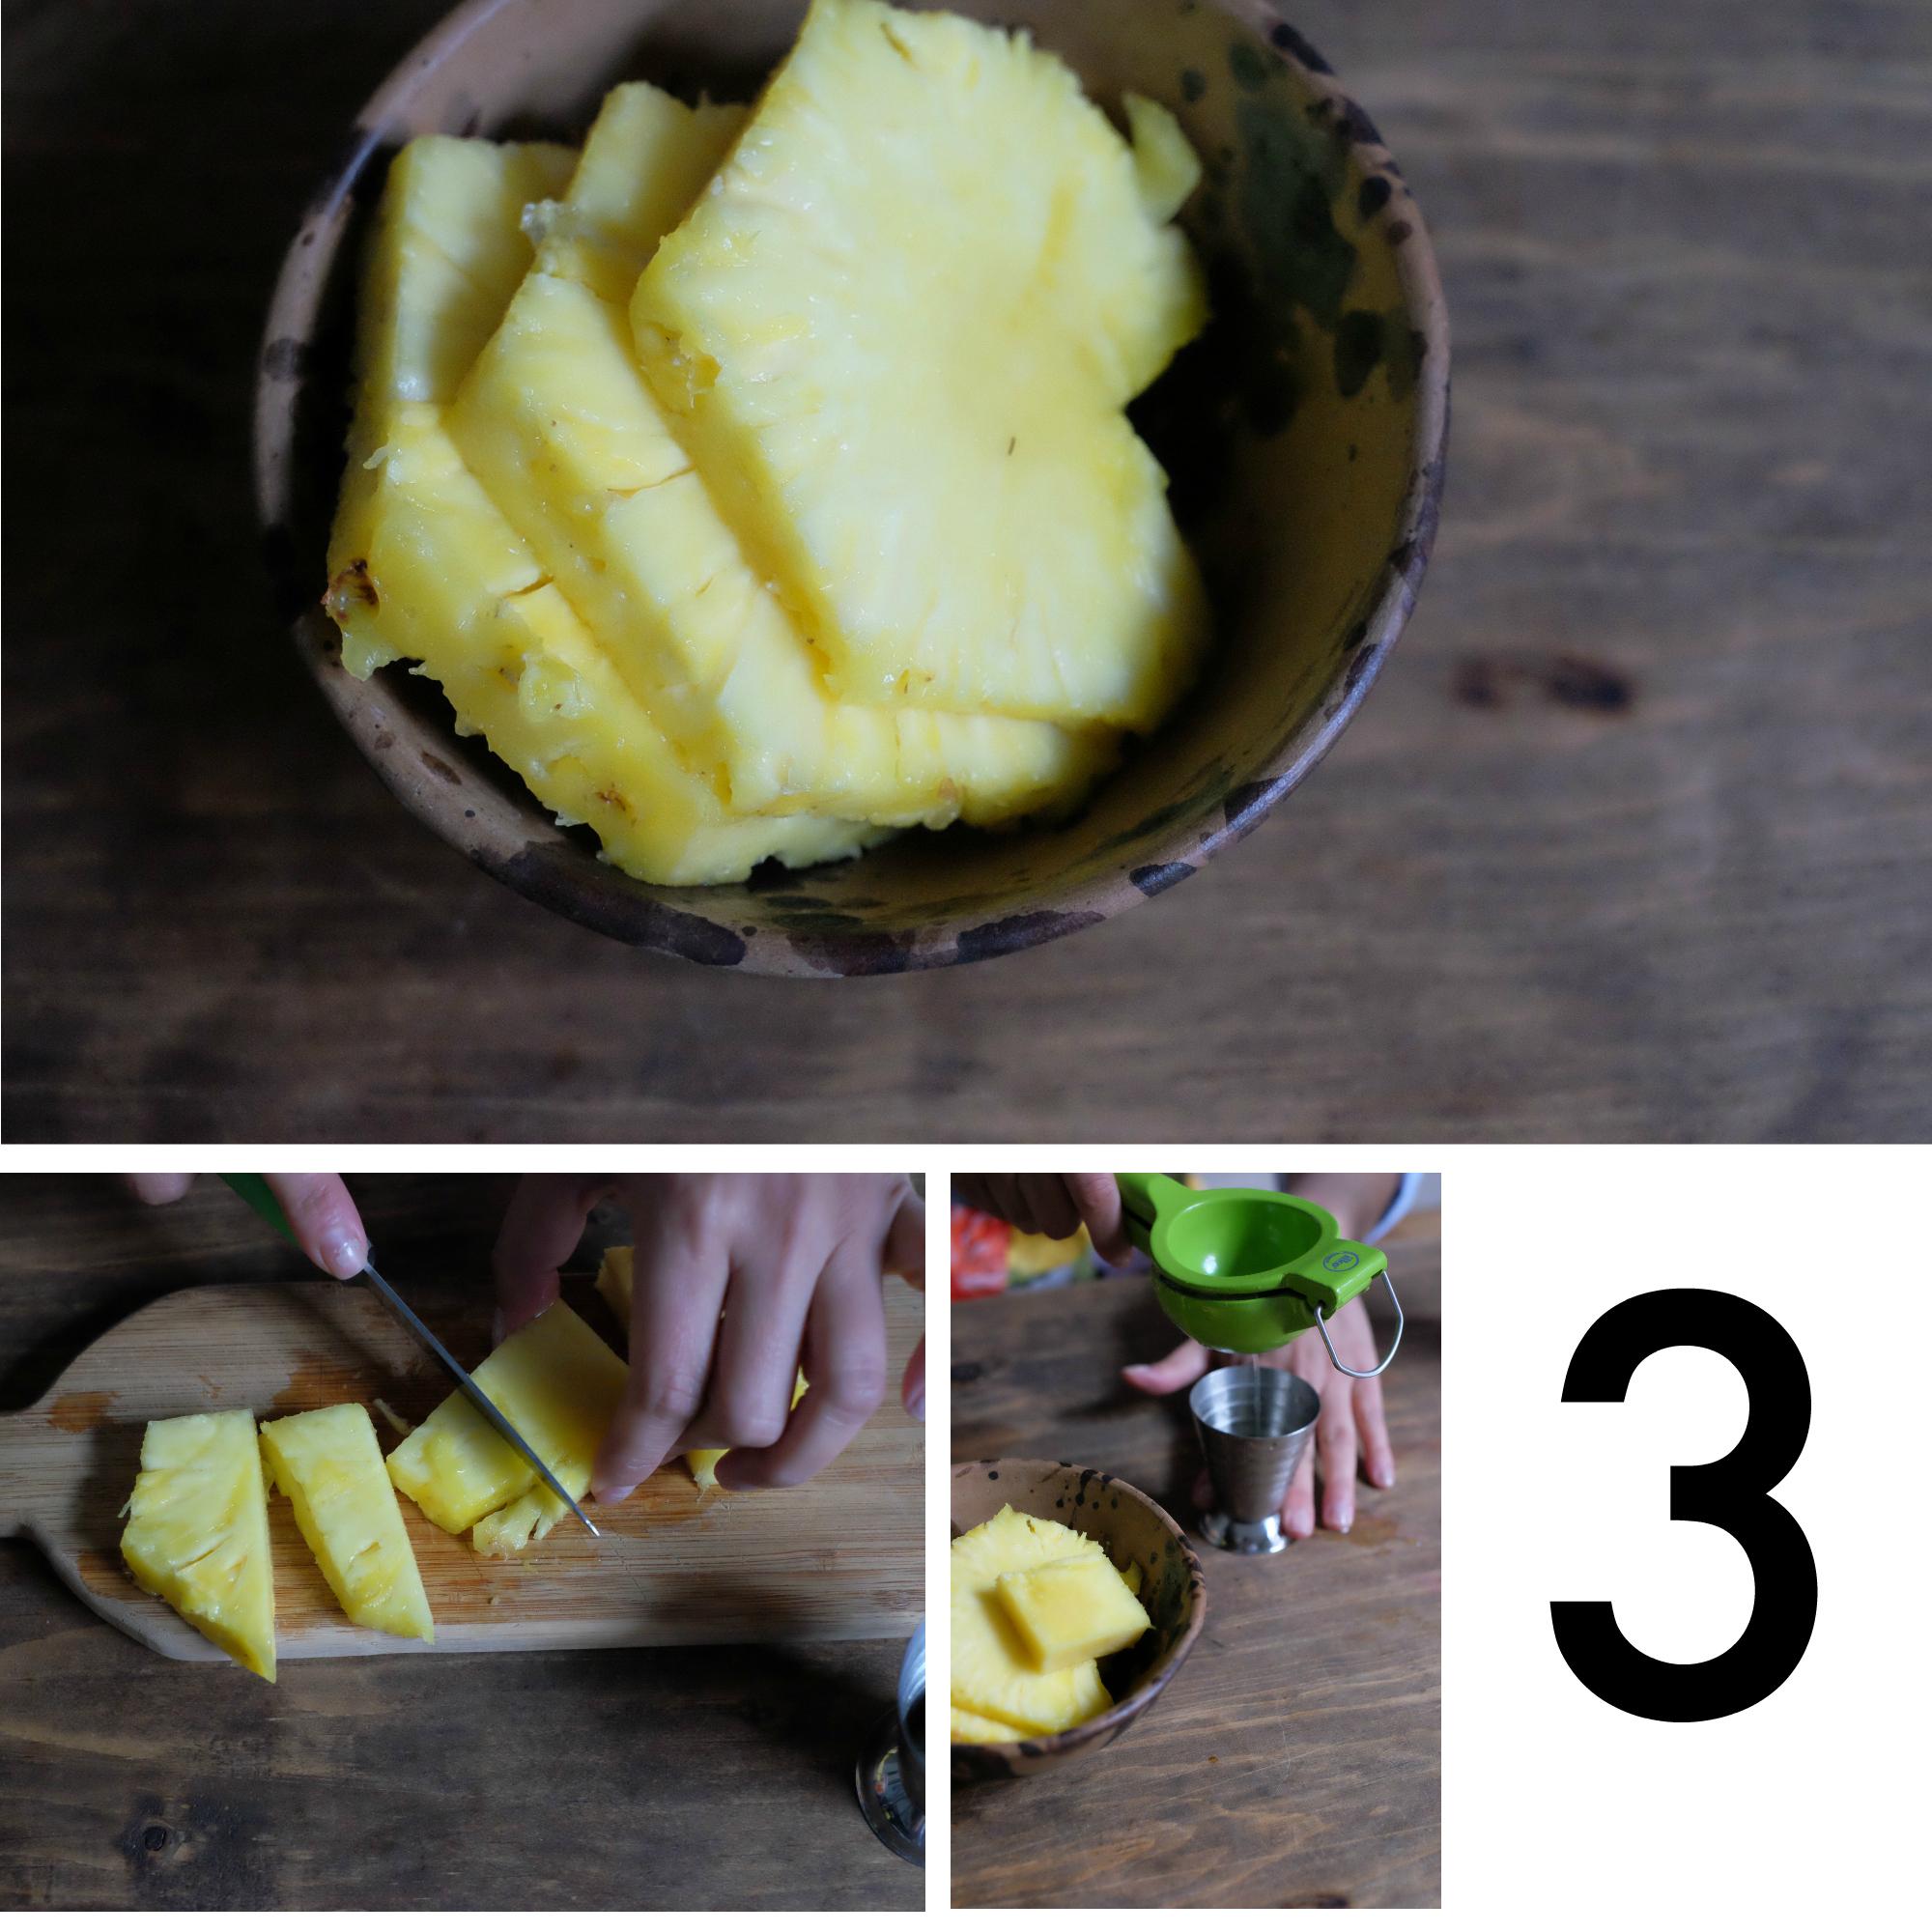 pineapple cocktail ingredients